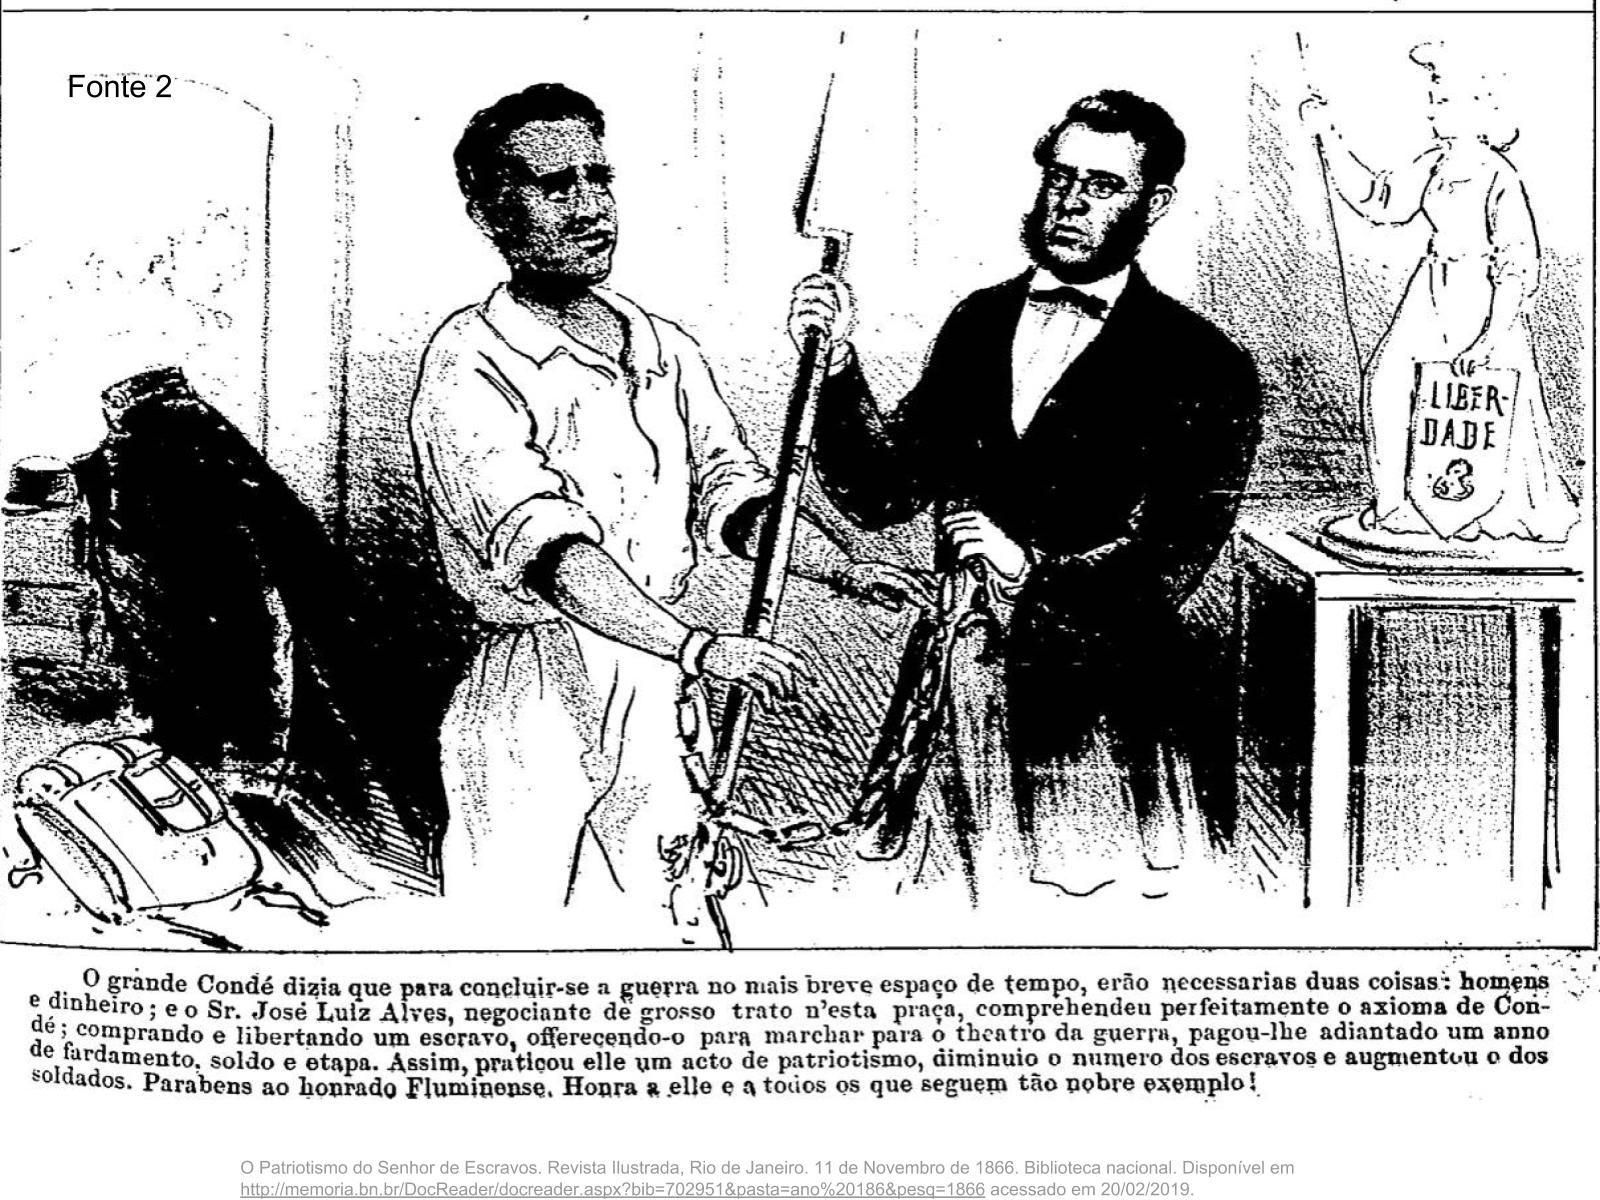 Os negros na Guerra do Paraguai (1864-1870)